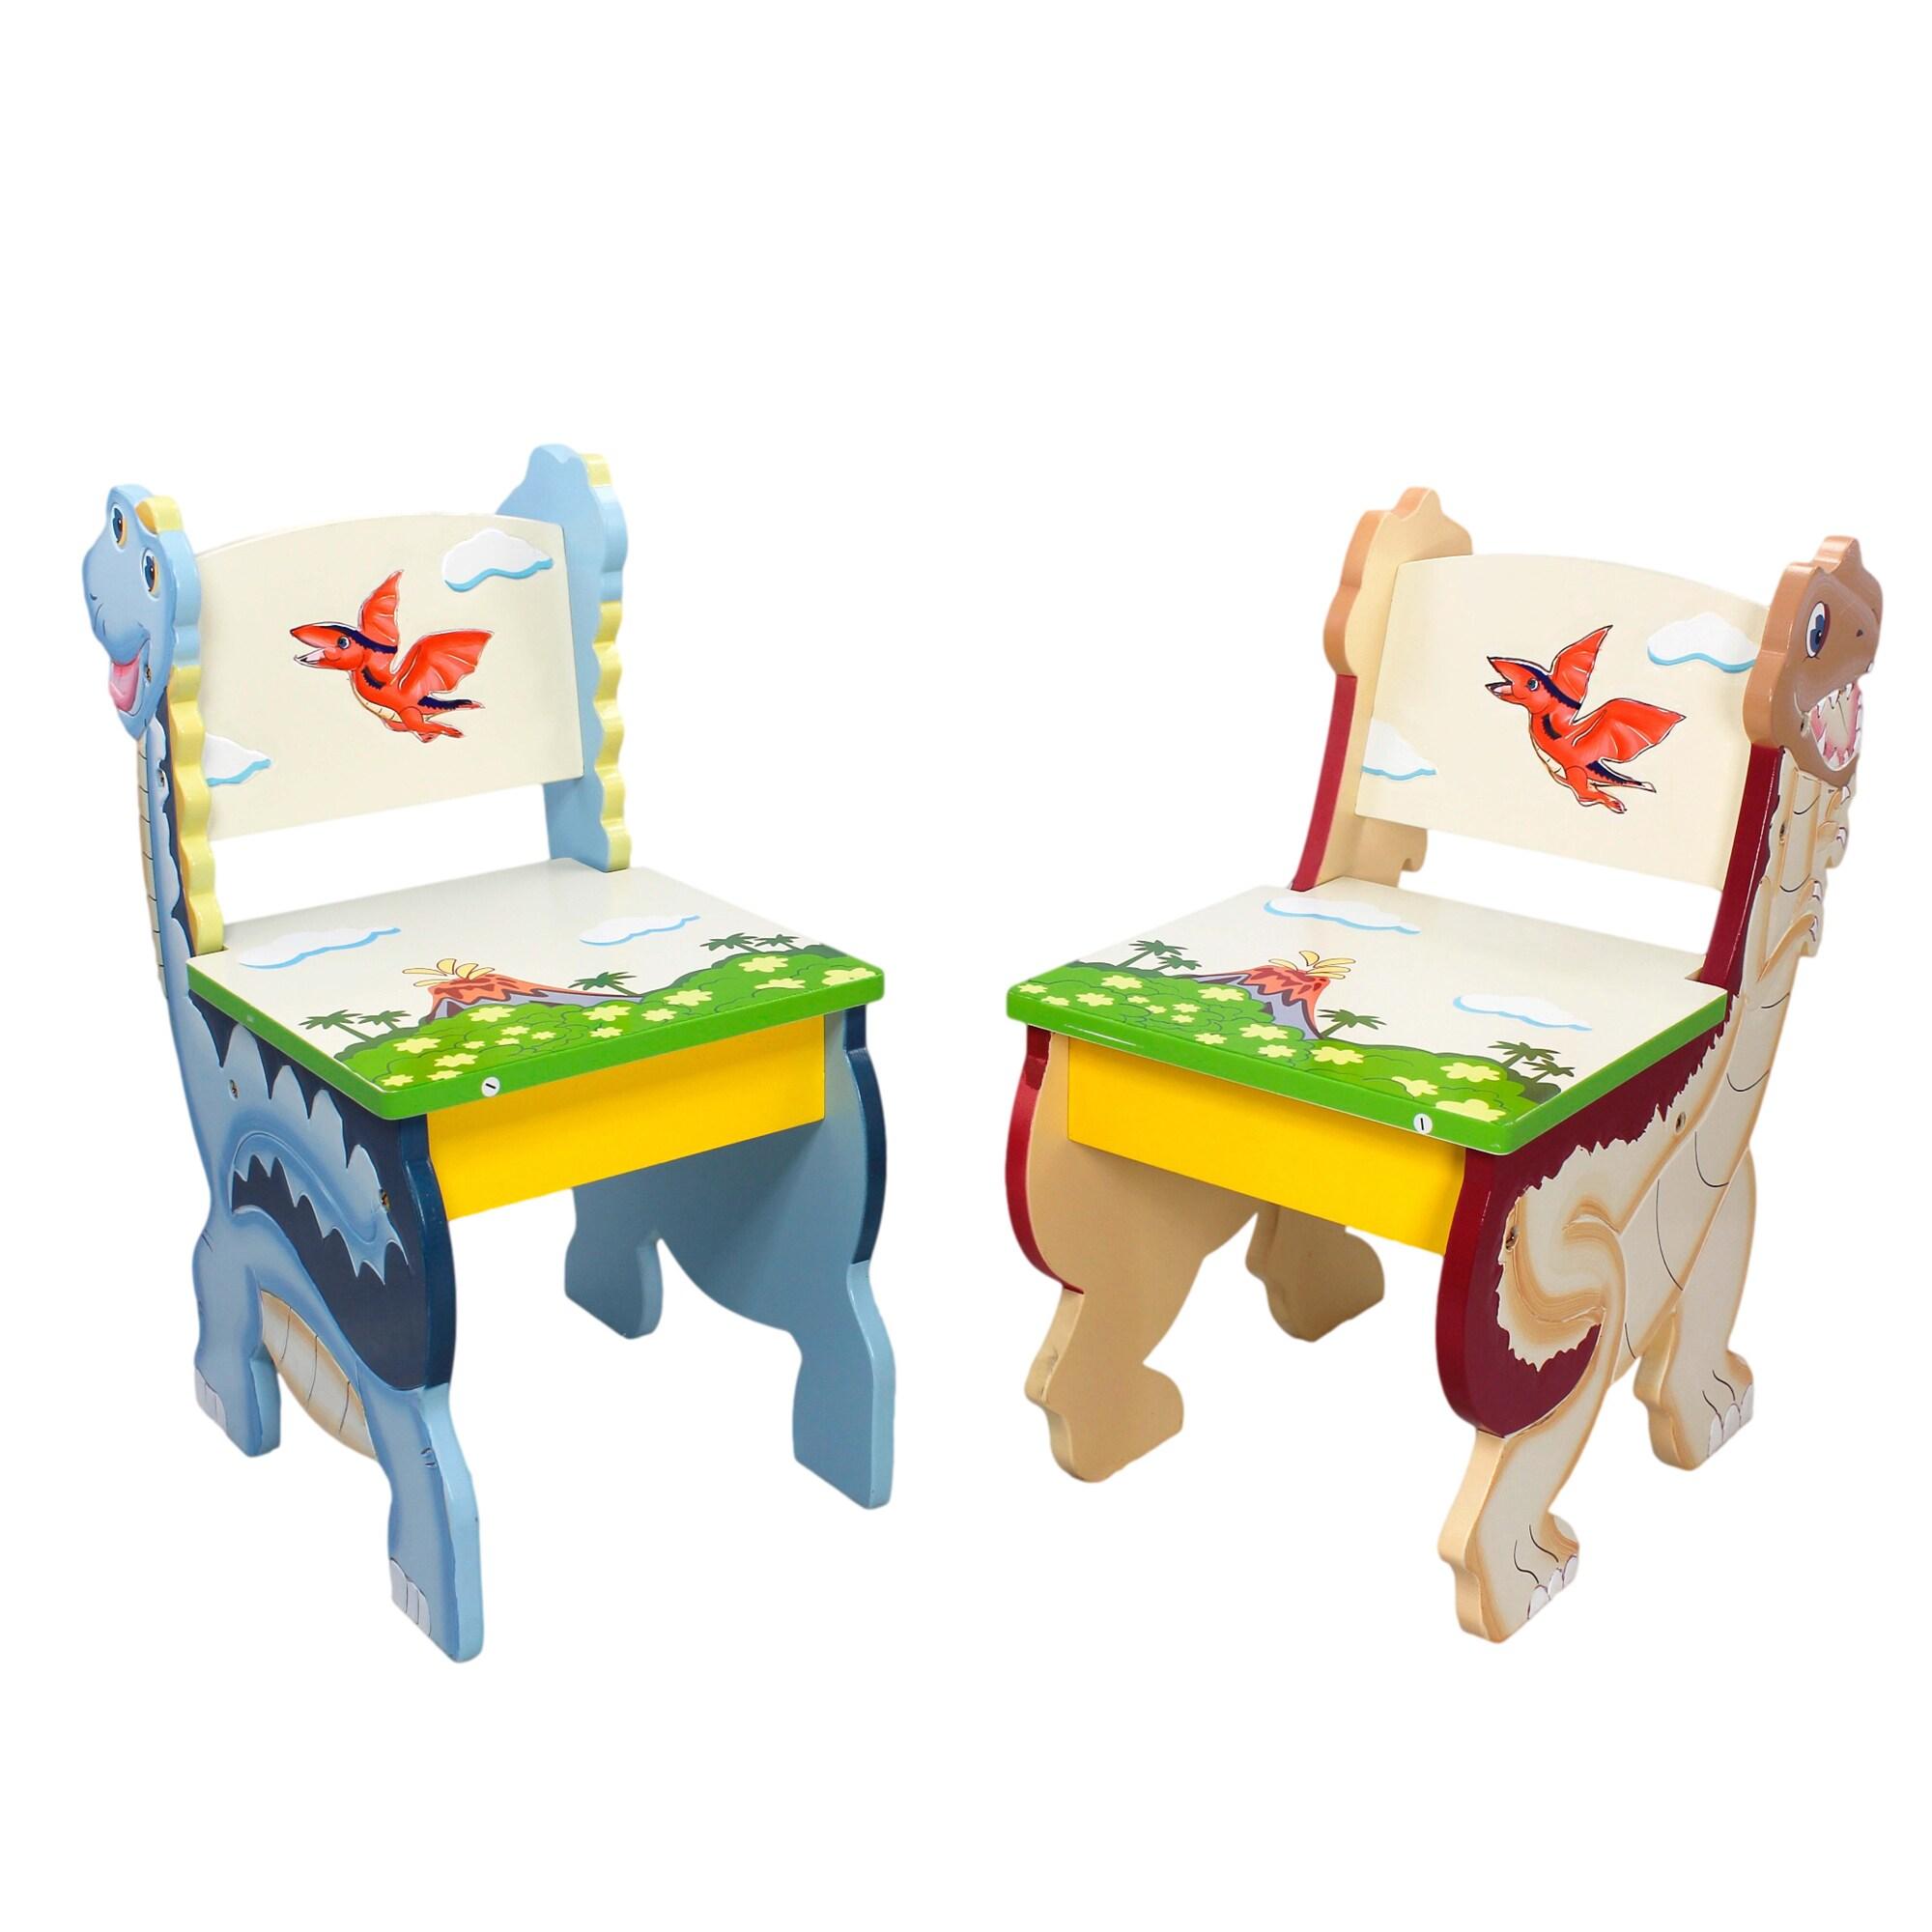 Teamson Fantasy Fields - Dinosaur Kingdom Set of 2 Chairs...